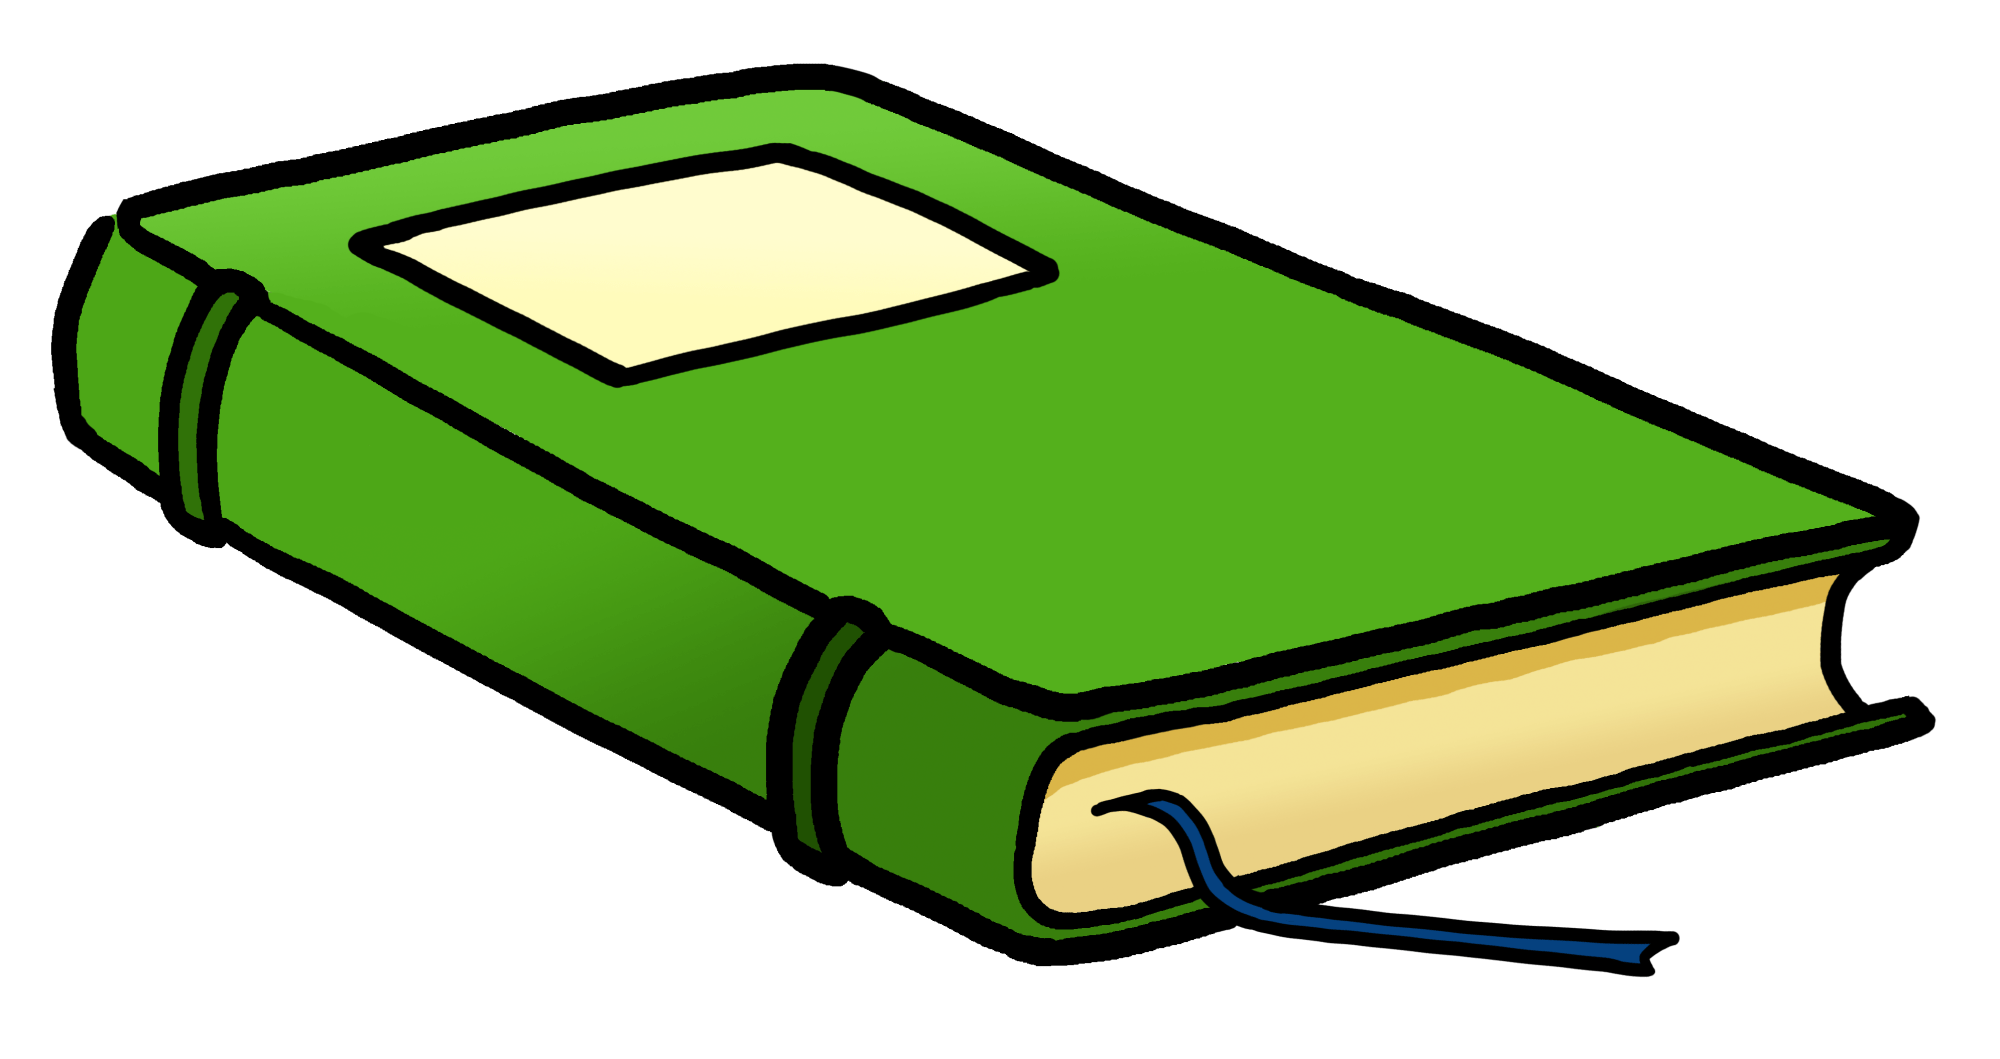 hight resolution of books clip art image